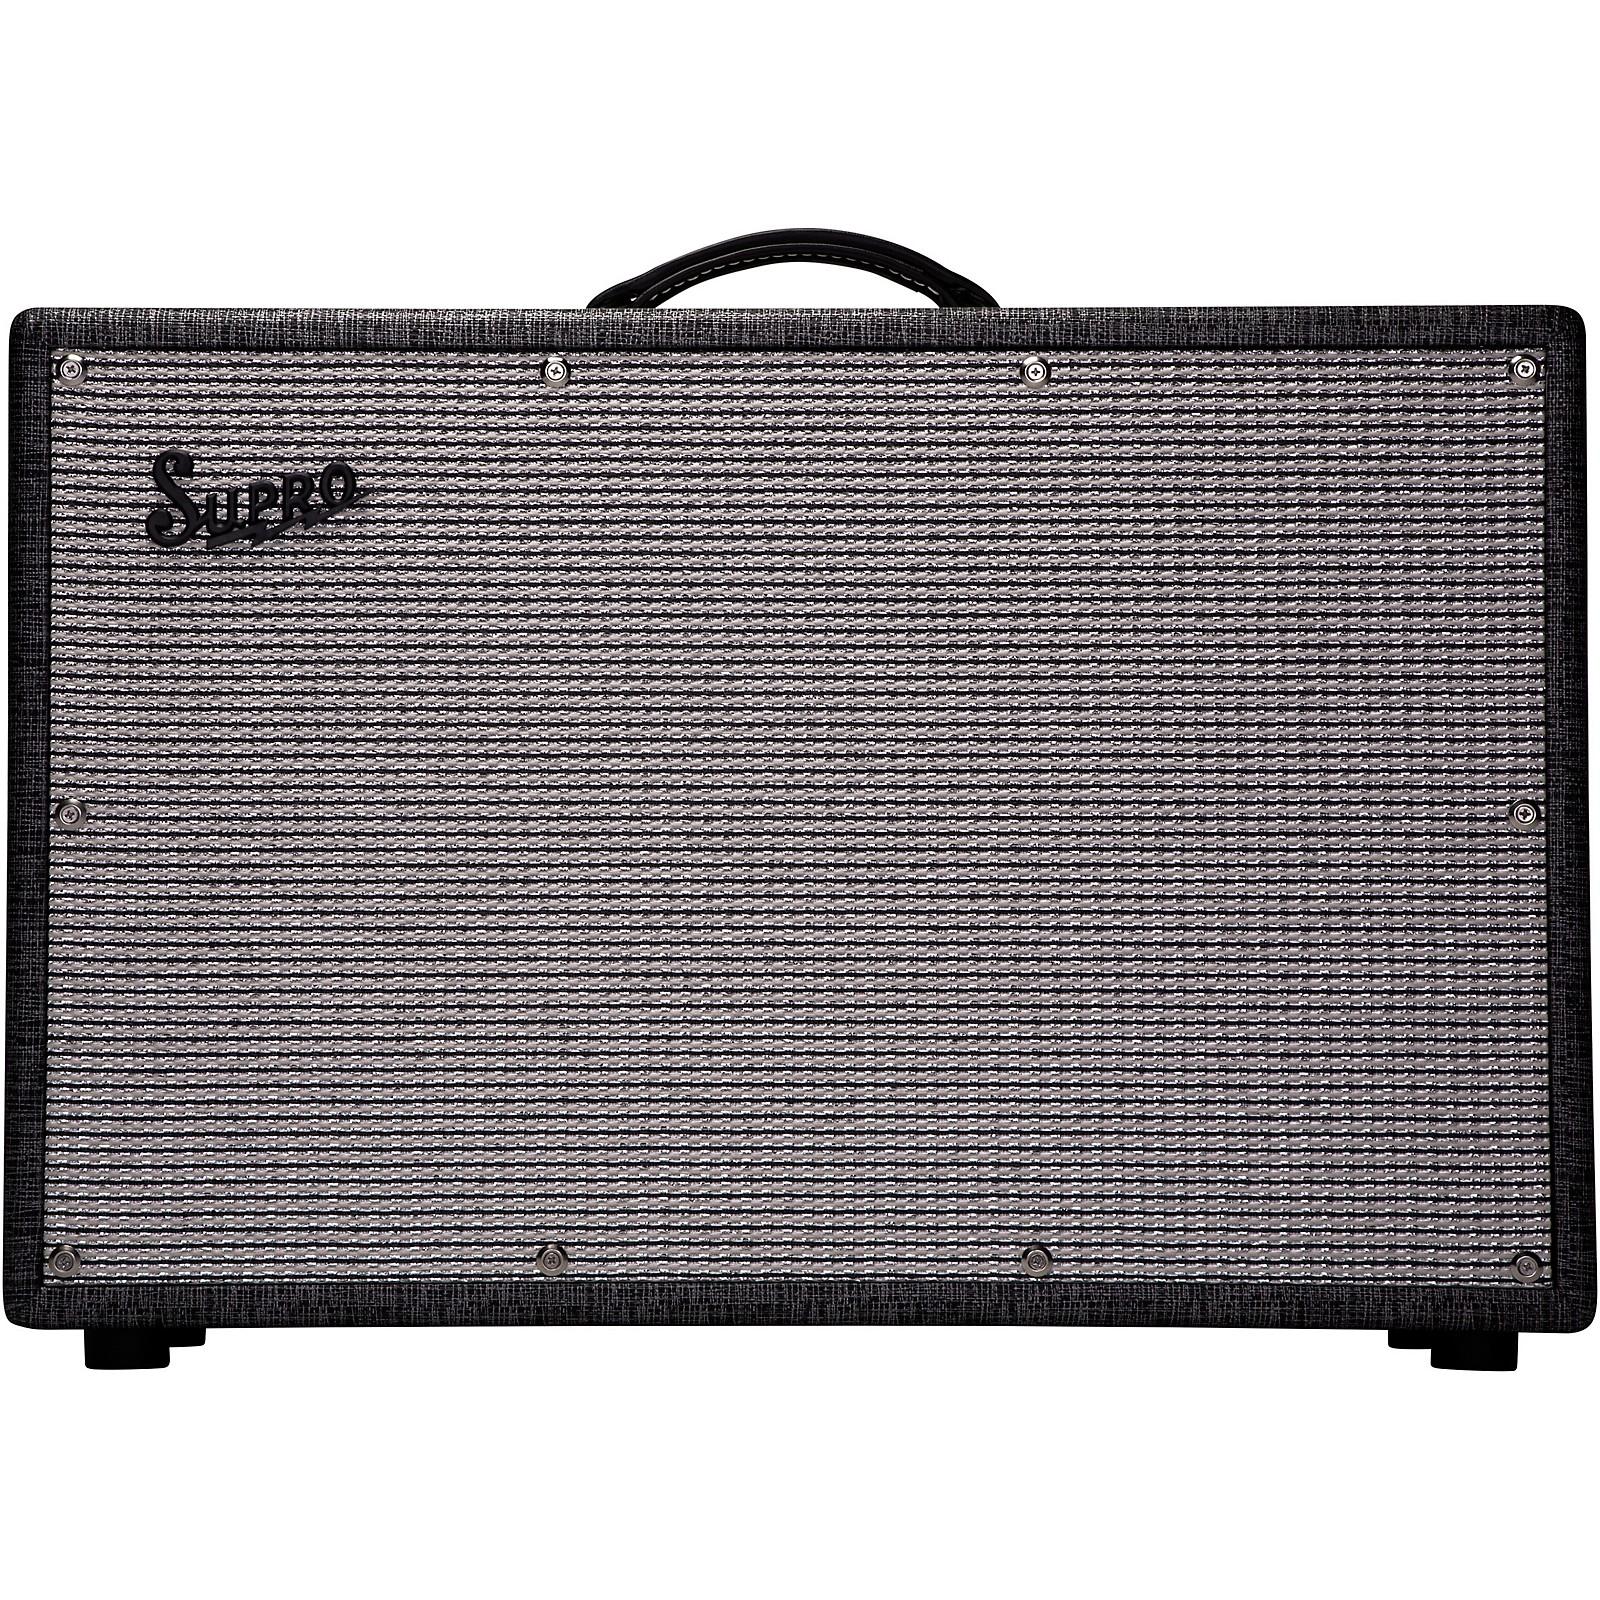 Supro 1799 Statesman 150W 2x12 Guitar Extension Speaker Cabinet